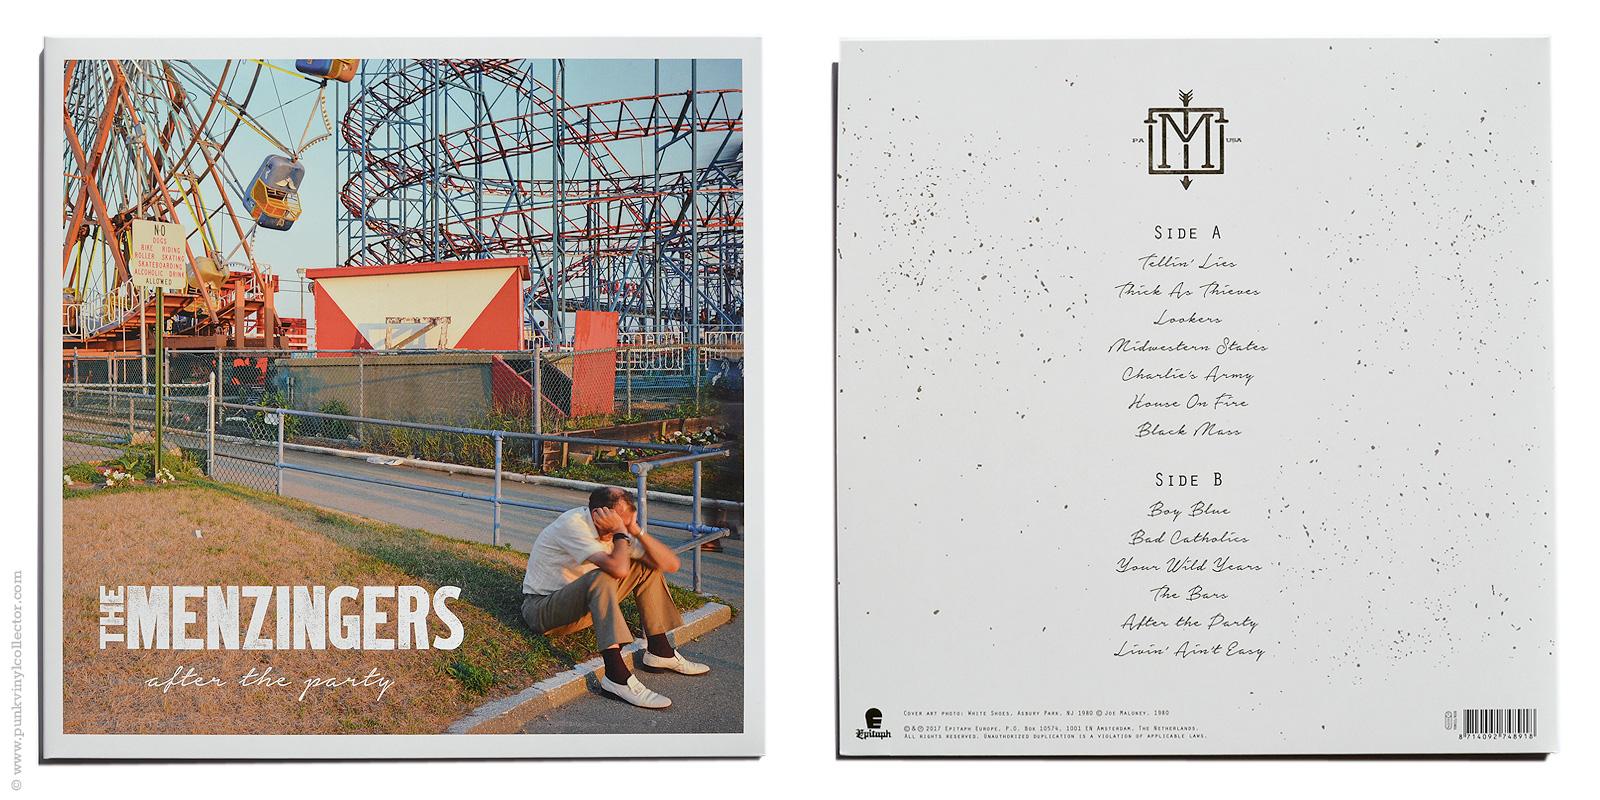 The Menzingers Punk Vinyl Collector